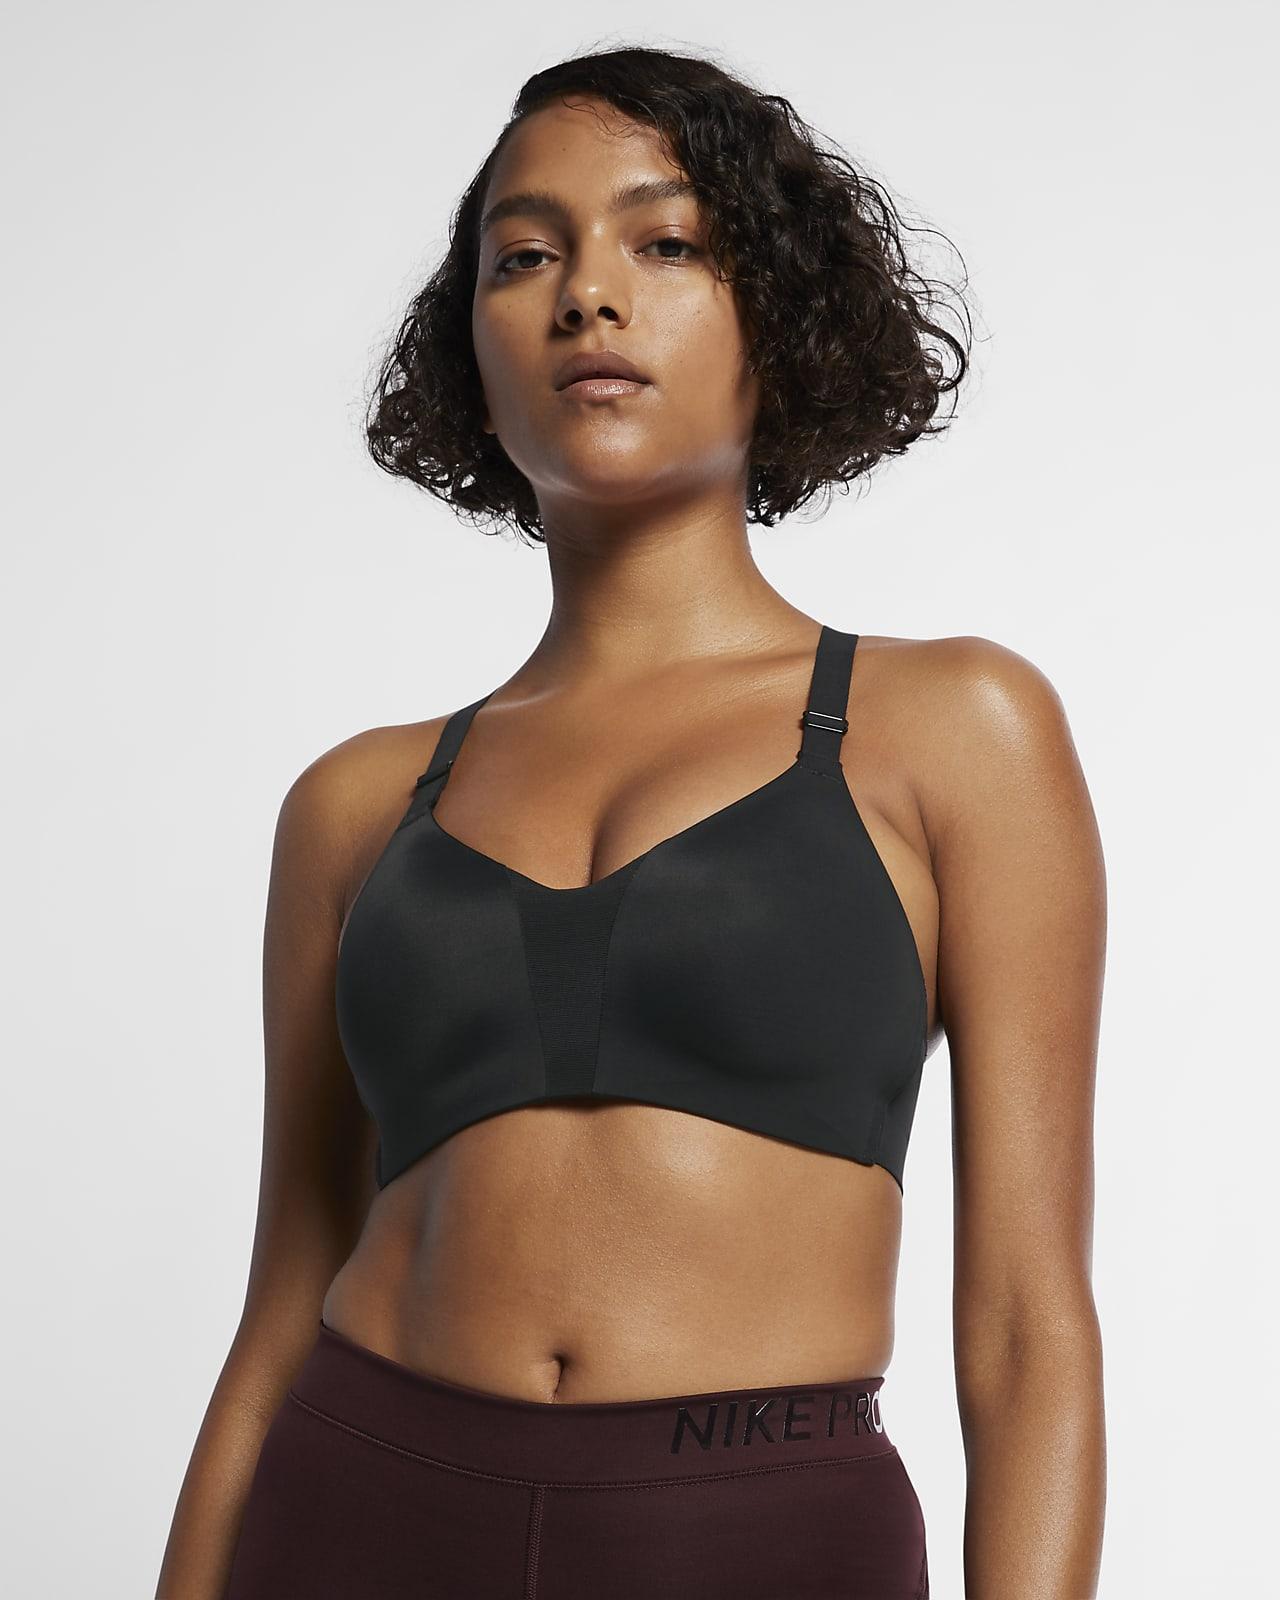 Nike Rival Women's High-Support Sports Bra